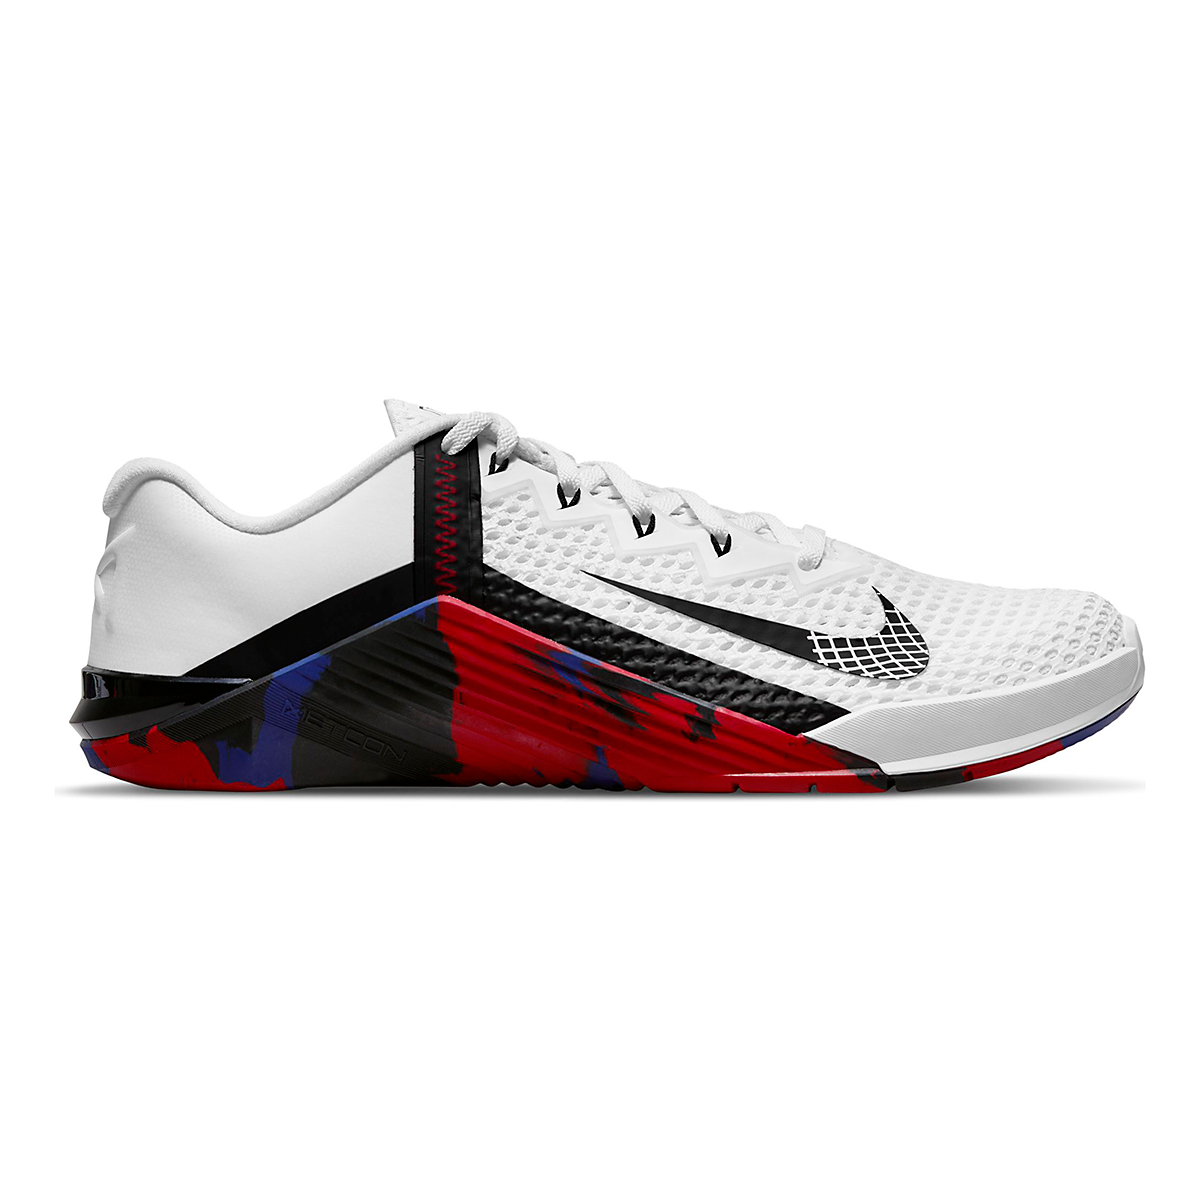 Men's Nike Metcon 6 Training Shoe - Color: White/Black/Gym Red/Deep Royal Blue - Size: 4 - Width: Regular, White/Black/Gym Red/Deep Royal Blue, large, image 1